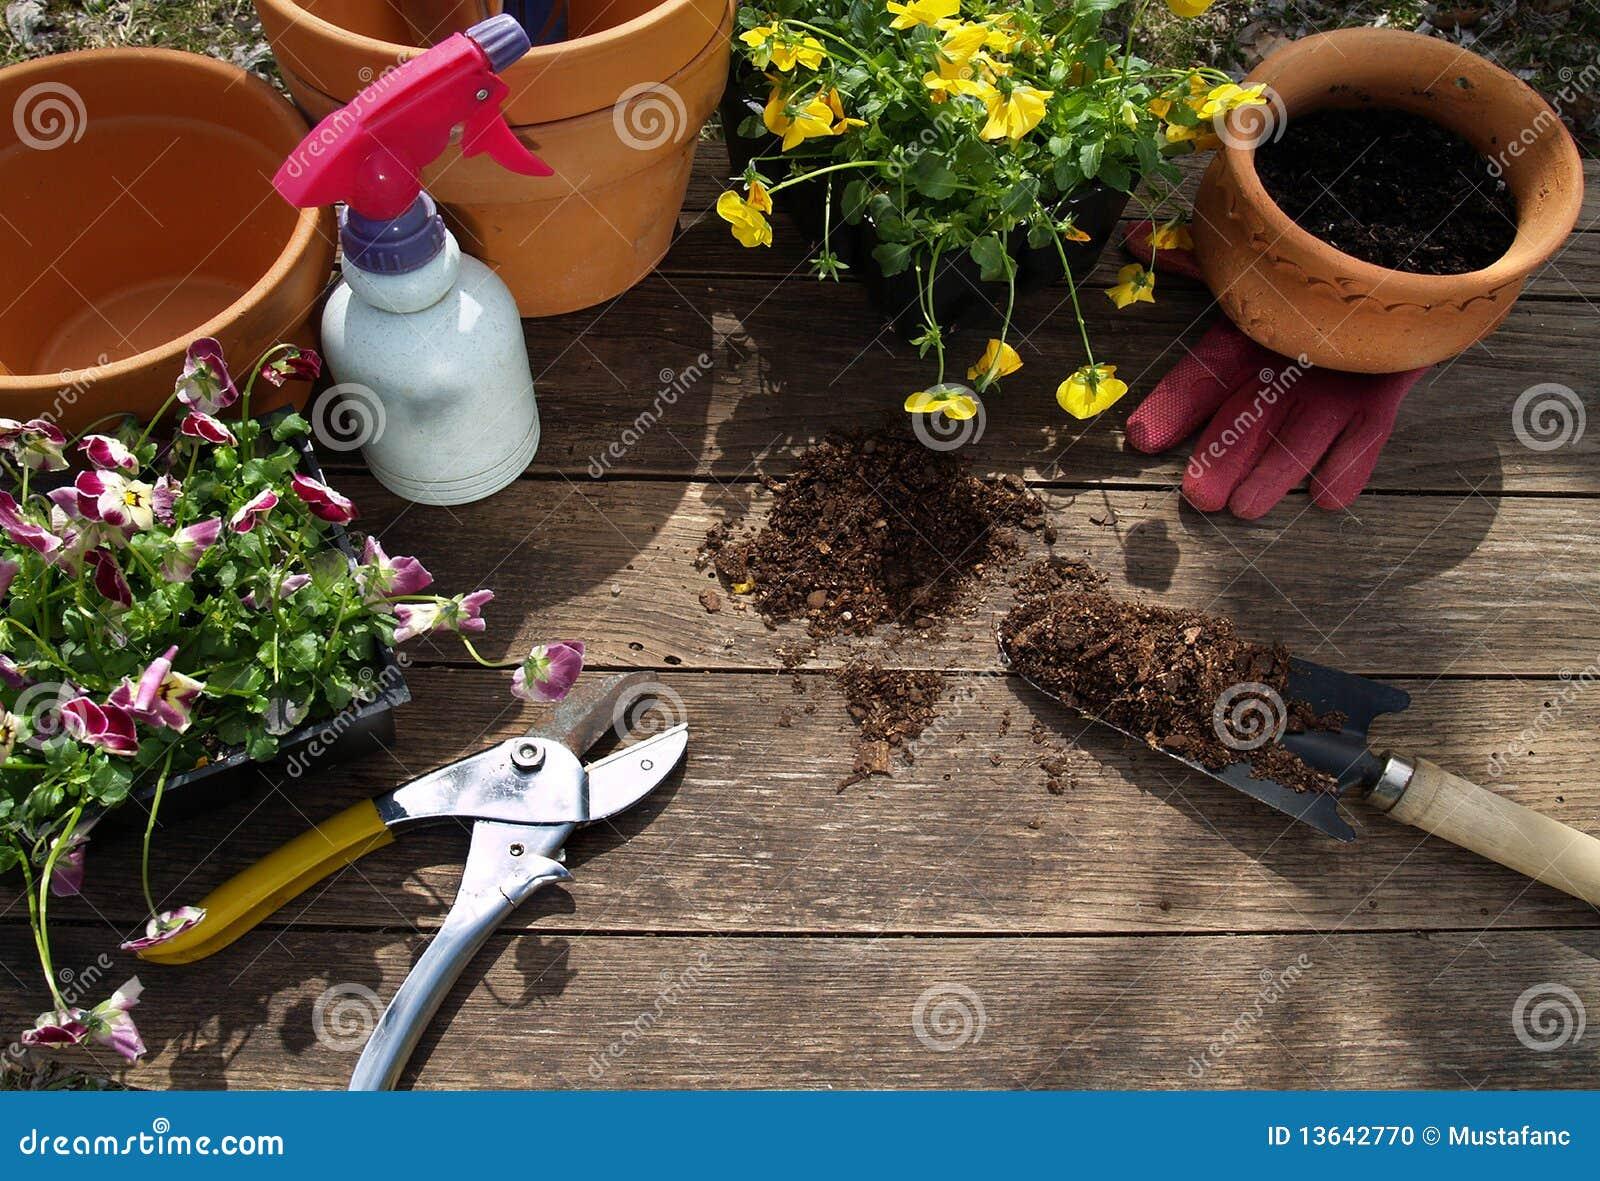 (1) ogrodnictwo